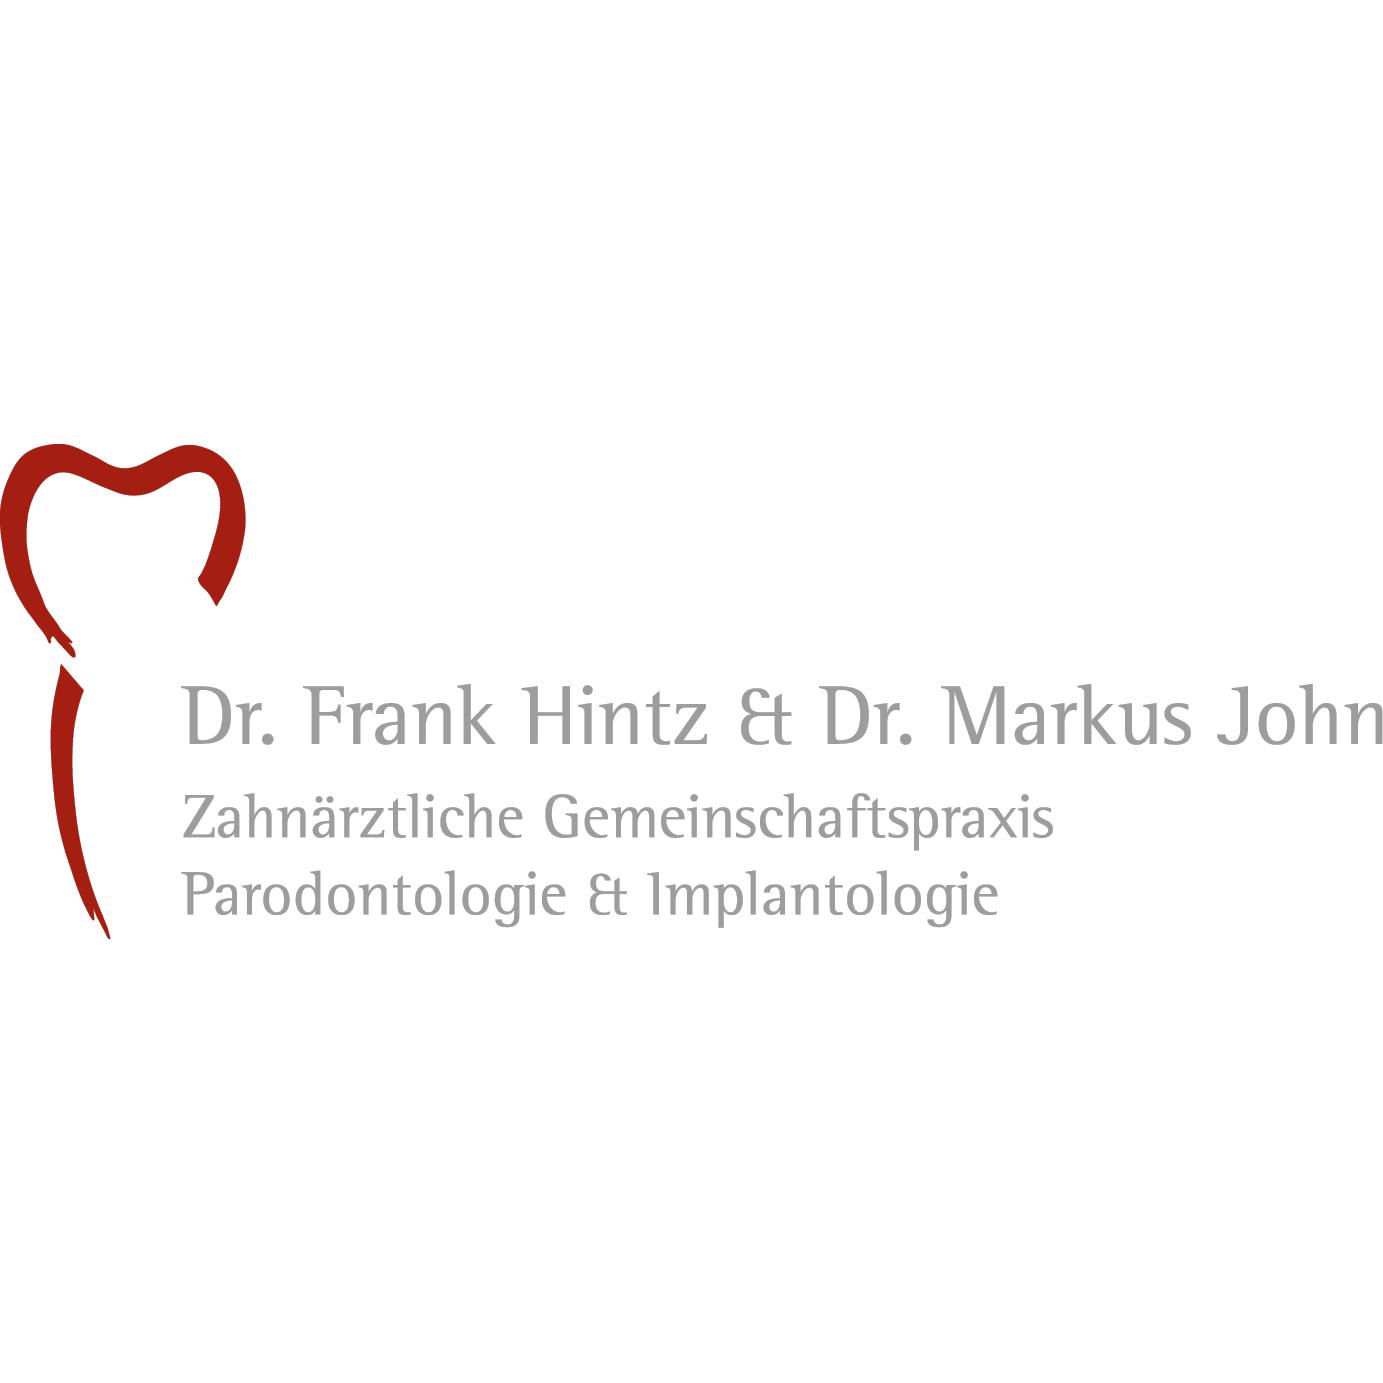 Bild zu Dr. Markus John & Dr. Frank Hintz in Obertshausen